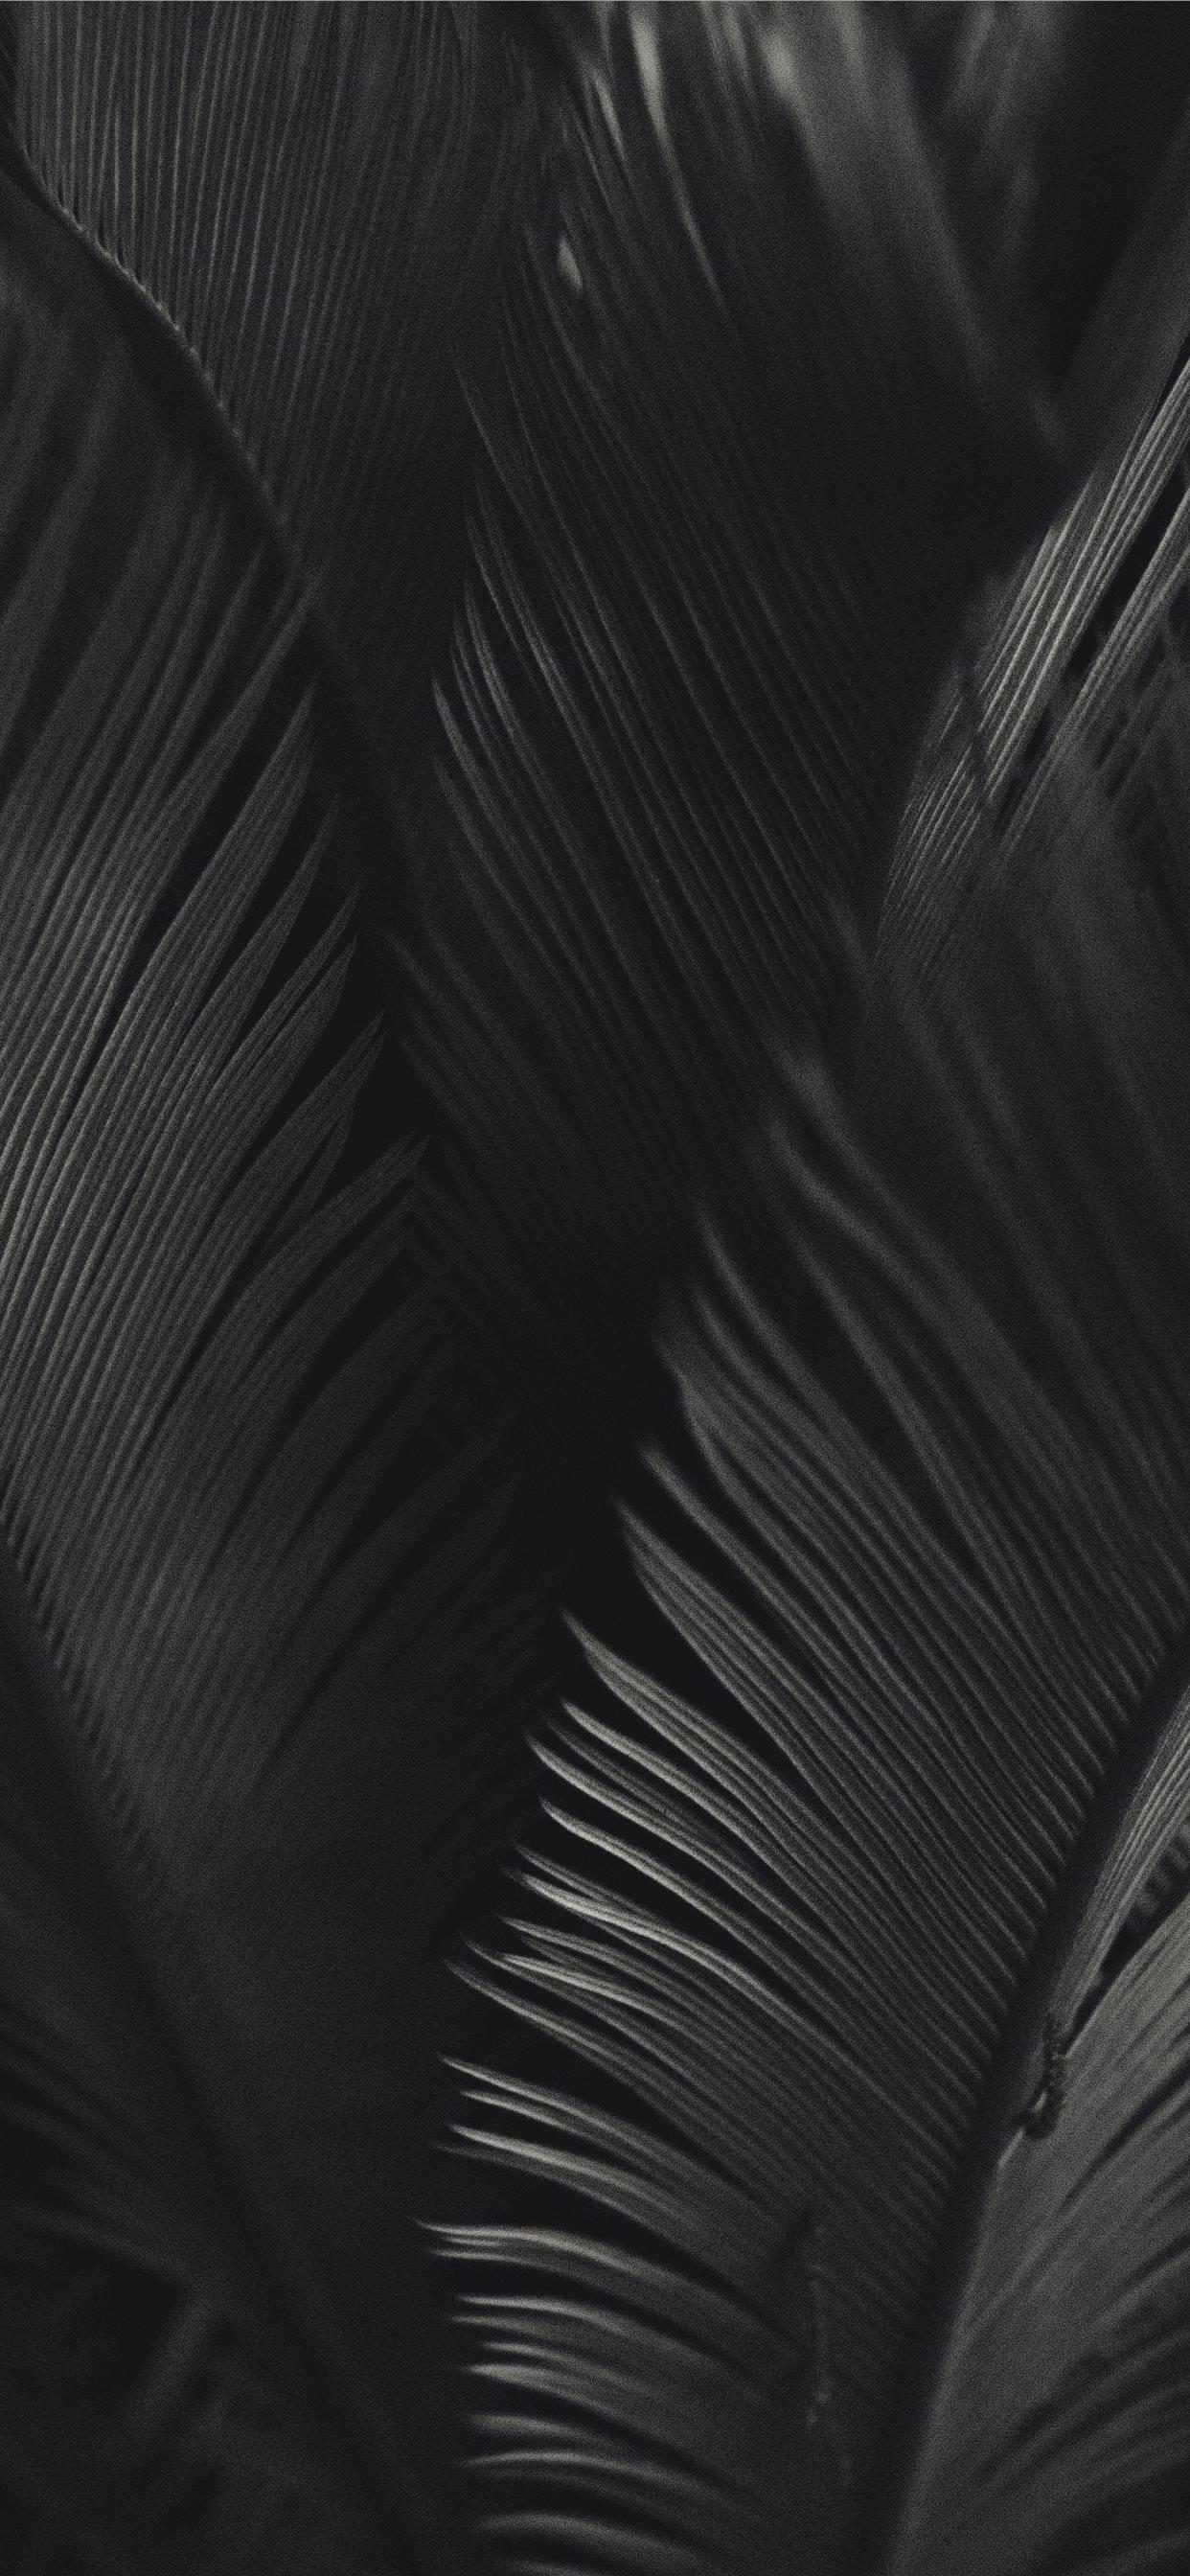 palm tree iphone xs max wallpaper